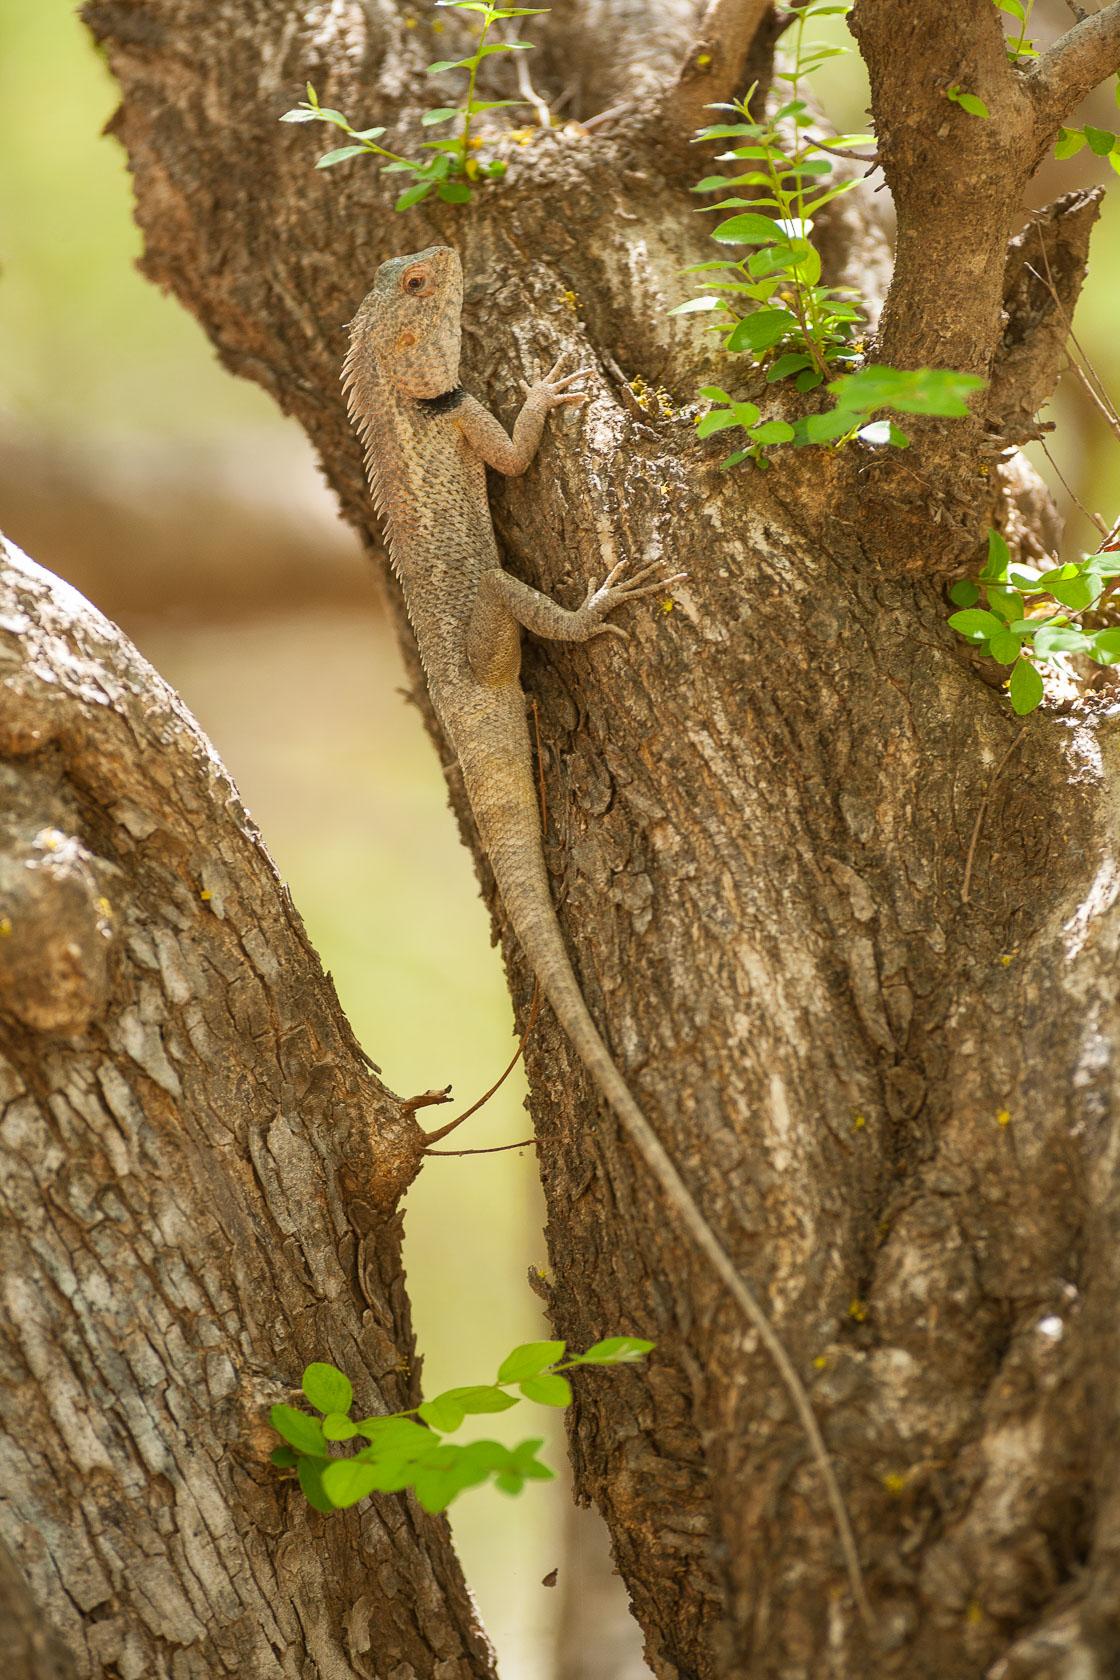 Agame versicolore (Calotes versicolor) dans le Wadi Darbat, à Oman